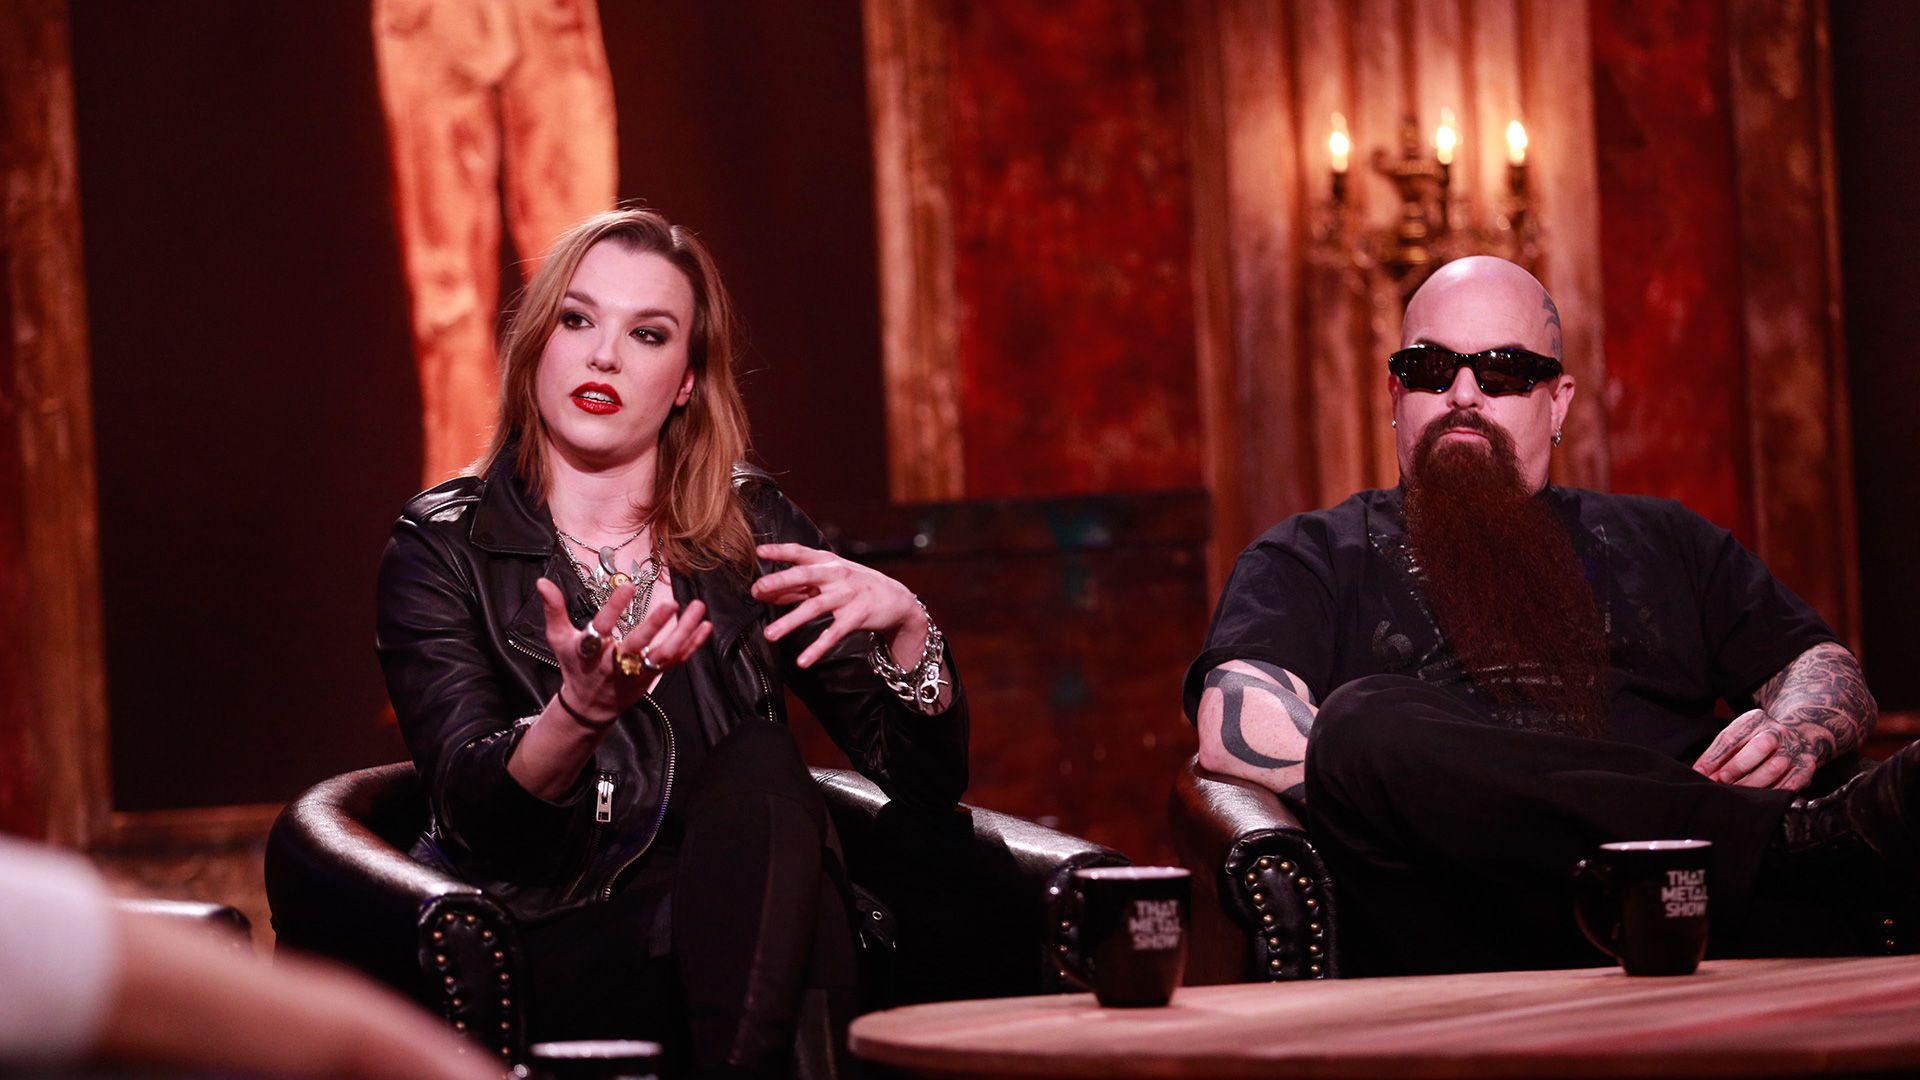 That Metal Show Episodes : that metal show season 14 ep 8 kerry king lzzy hale full episode vh1 ~ Vivirlamusica.com Haus und Dekorationen